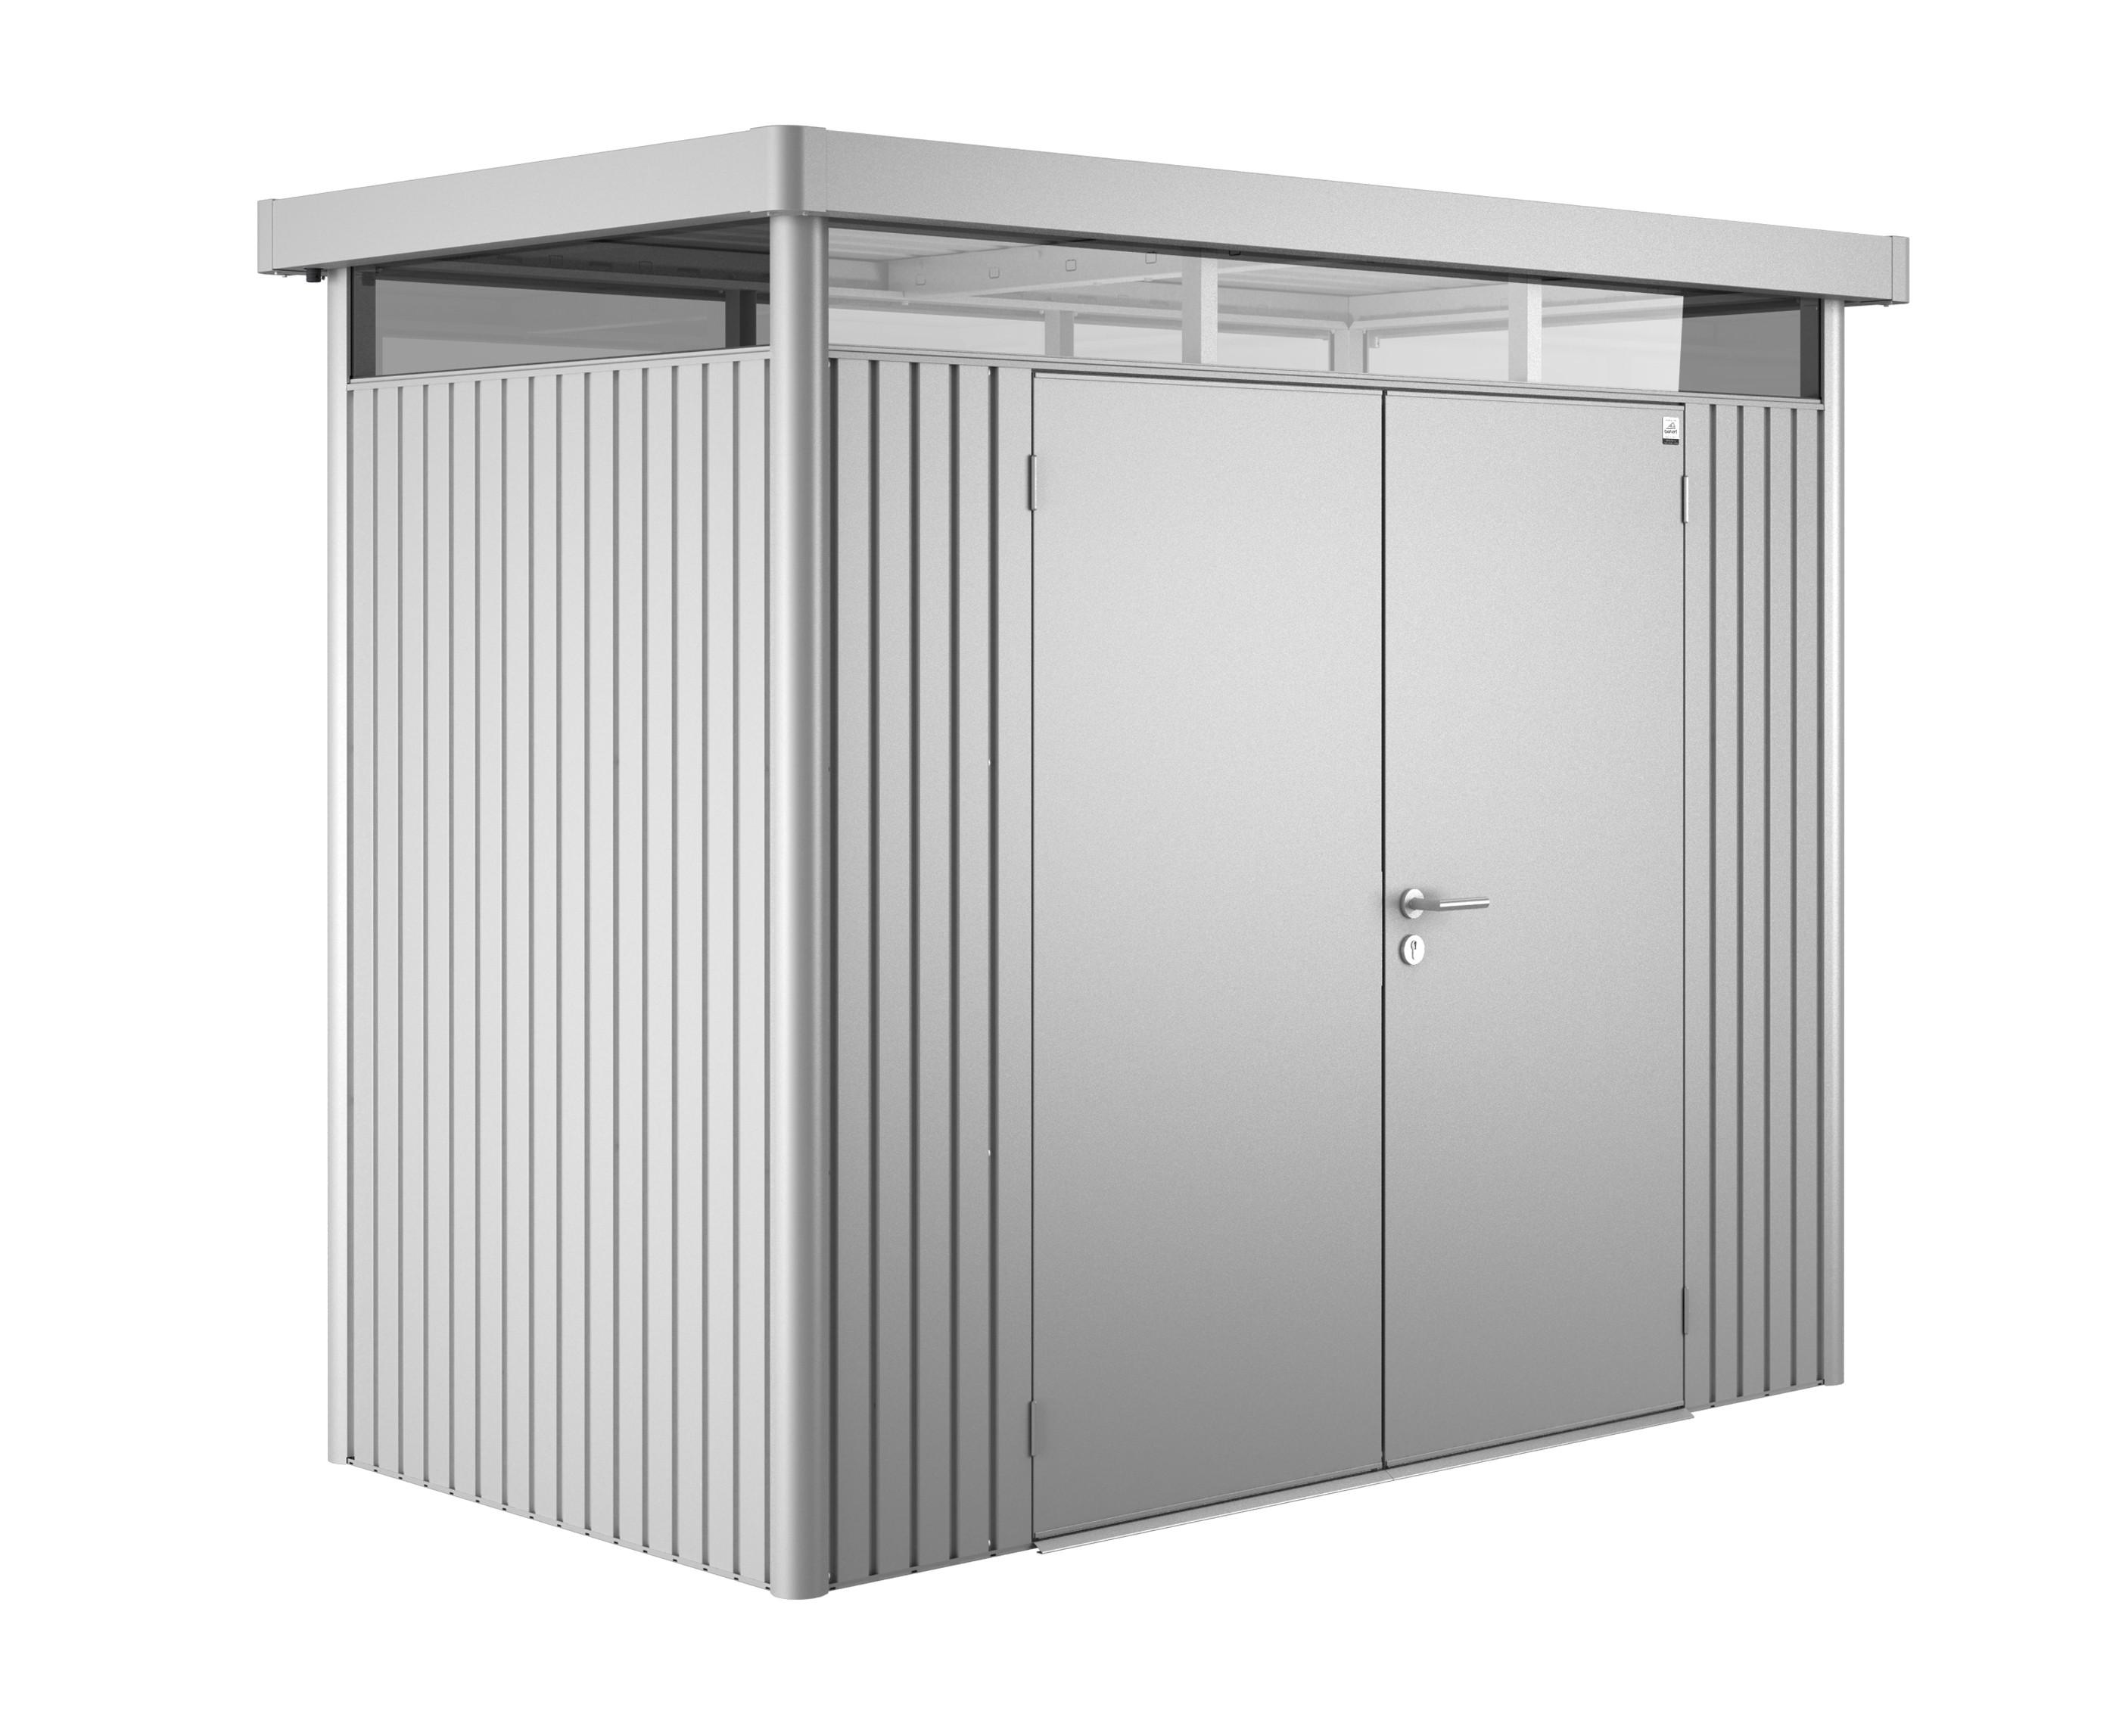 ger tehaus biohort highline h1 silber metallic dt 275x155x222cm bei. Black Bedroom Furniture Sets. Home Design Ideas